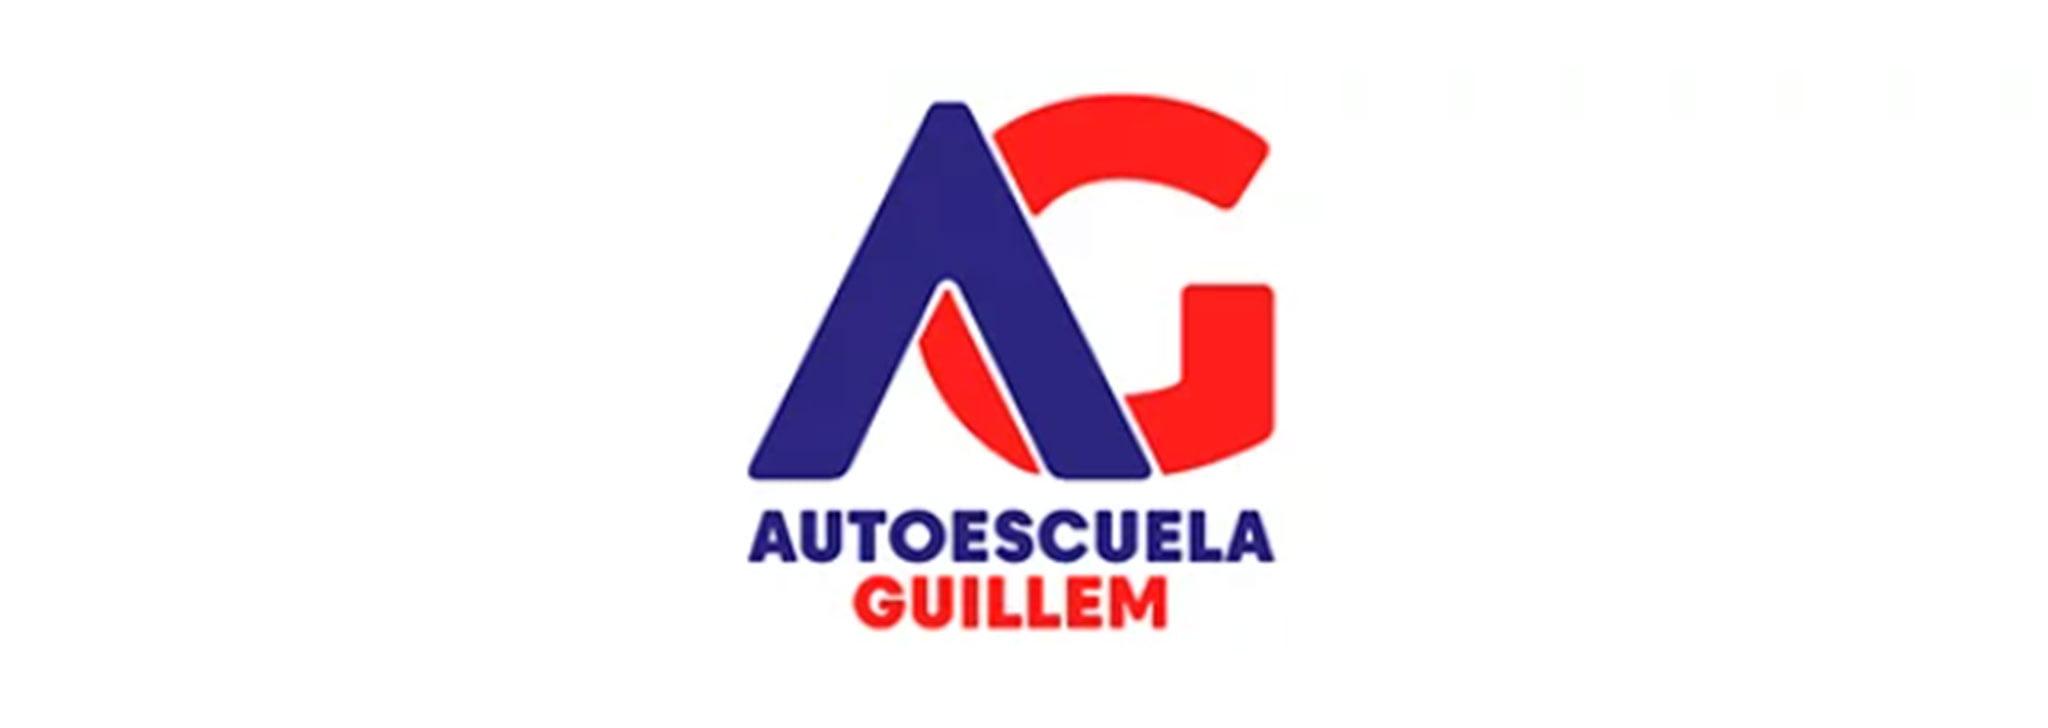 Logotipo de Autoescuela Guillem